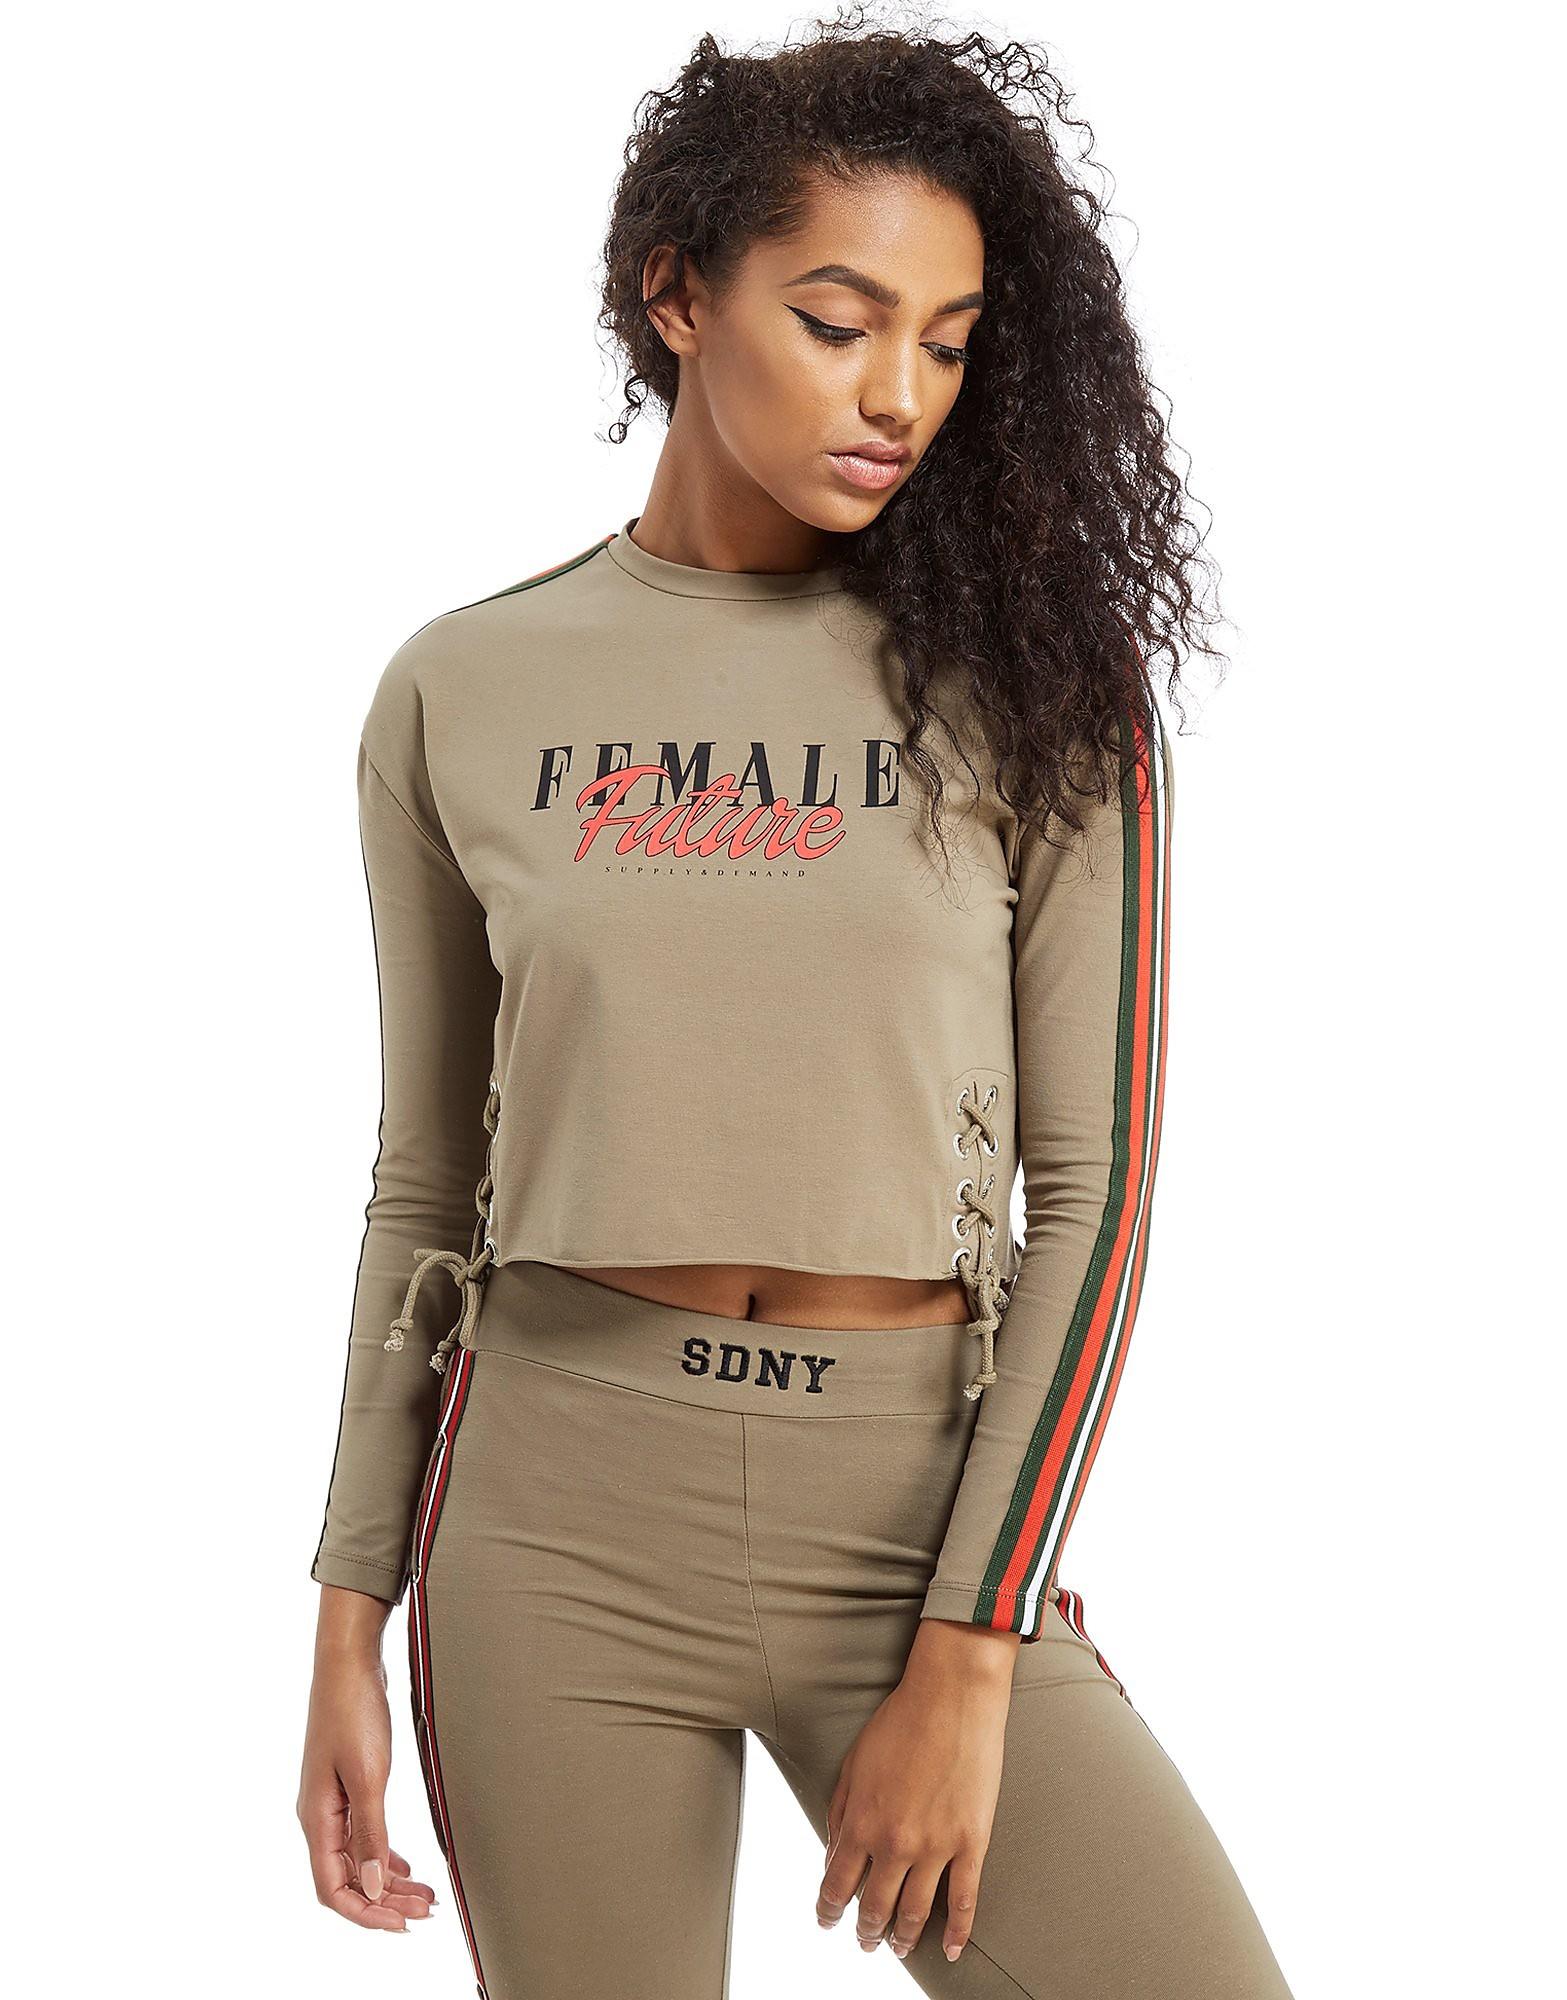 Supply & Demand Schnur Band T-Shirt